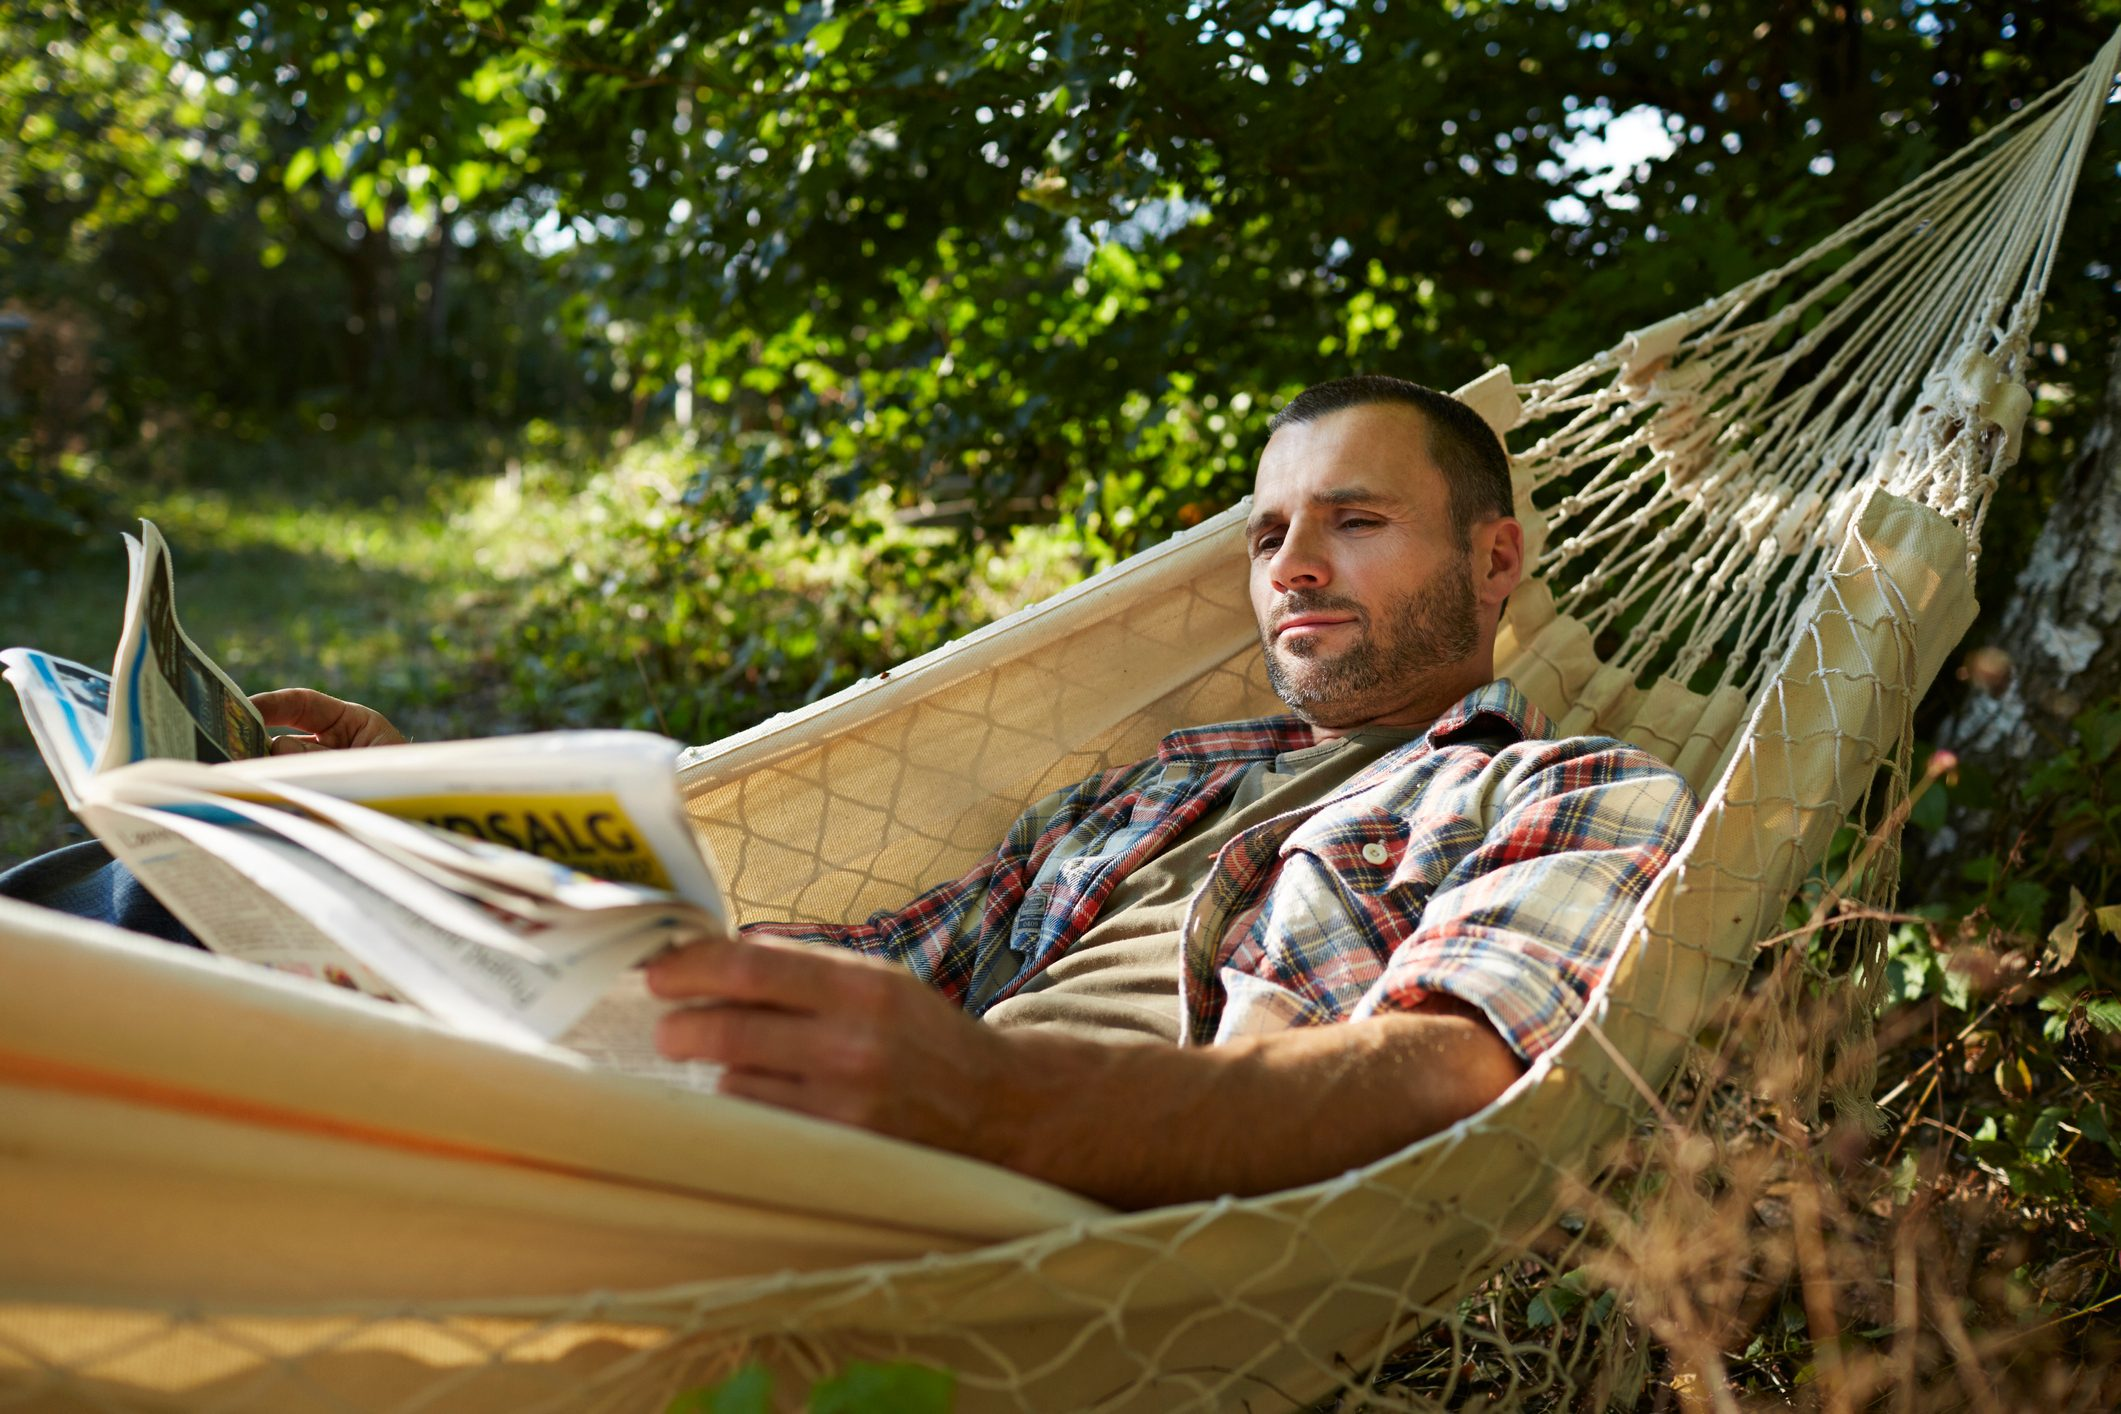 Man lies in hammock reading the paper